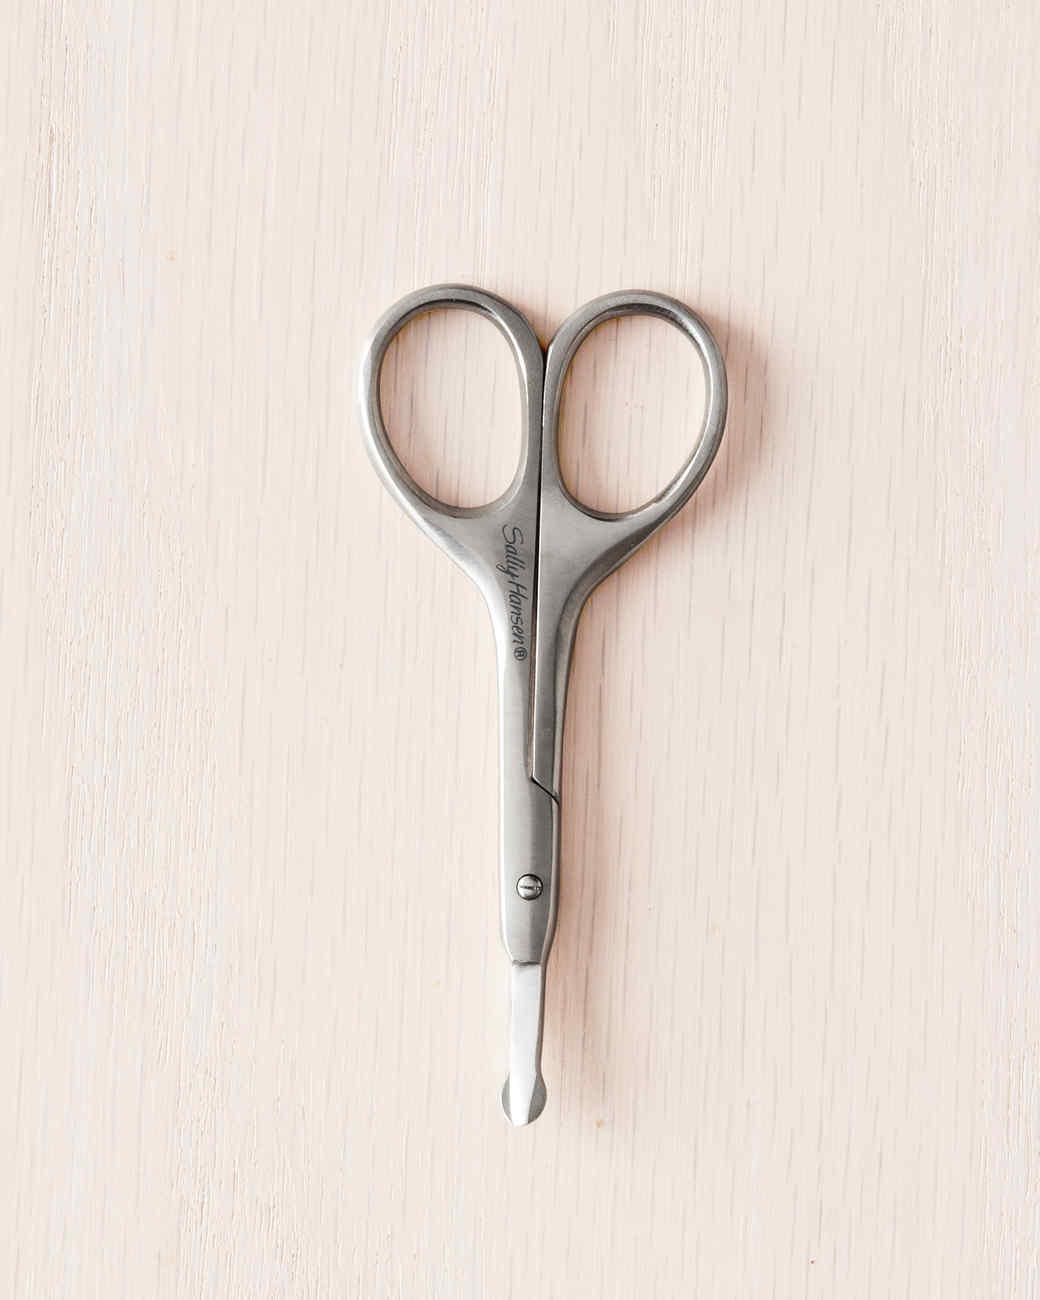 safety-scissors-composed-scissors-shot-046-d110947-0914.jpg